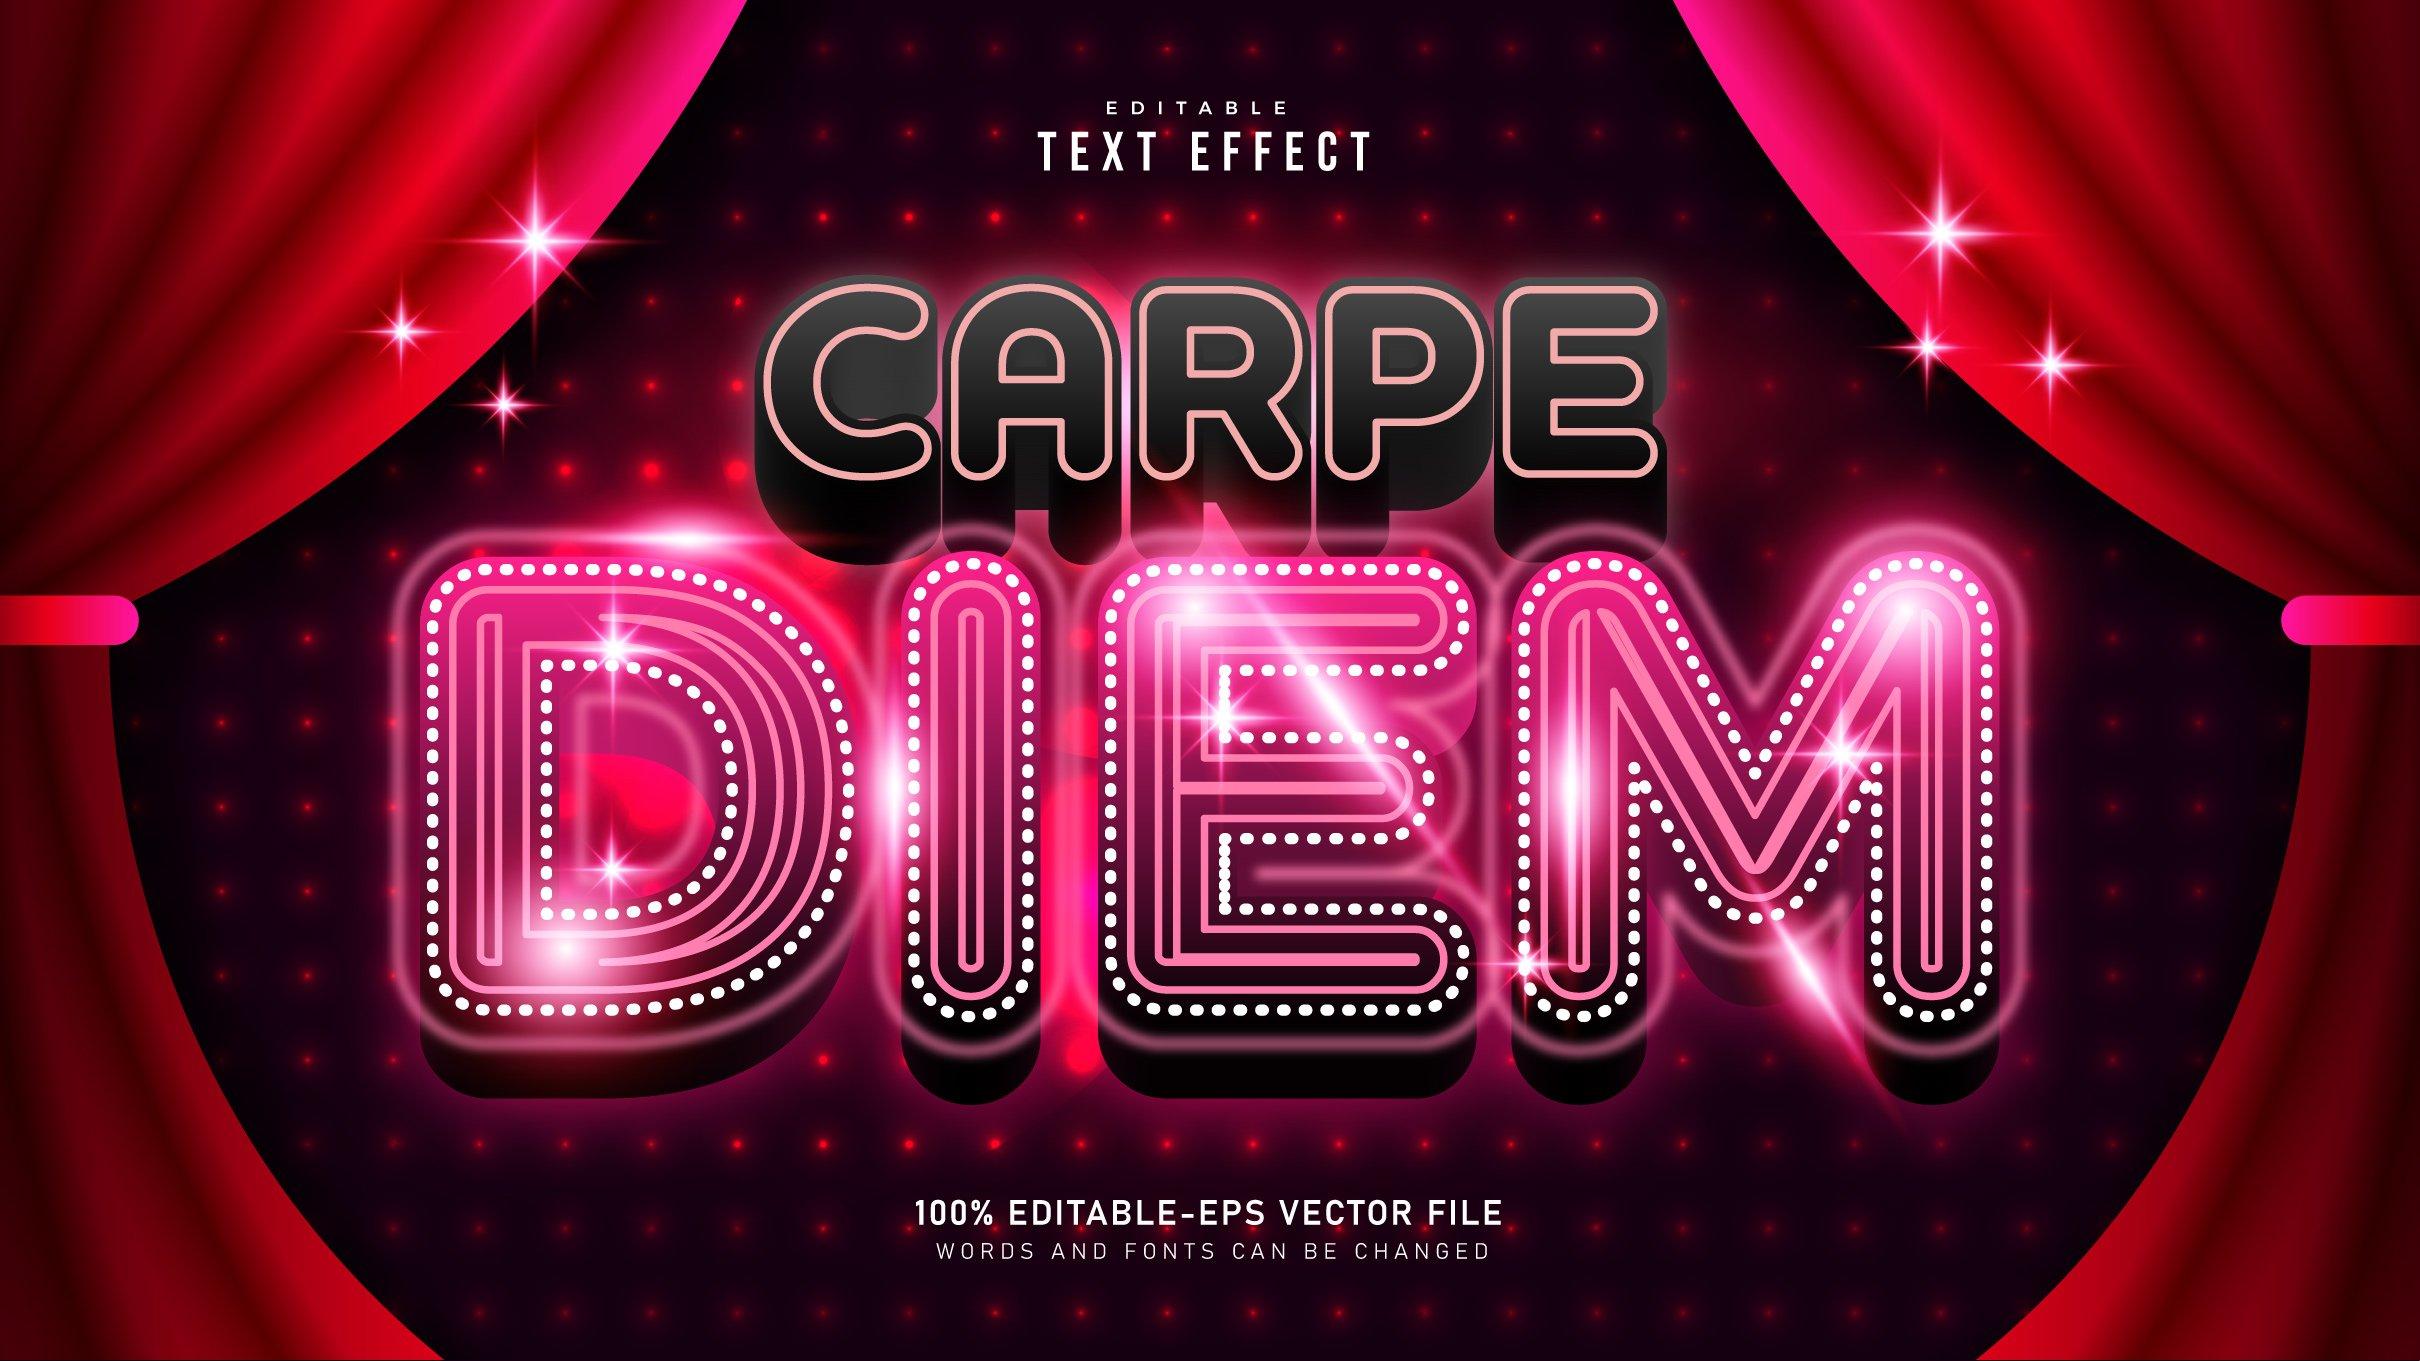 Crape-Diem-Movie-Time-Text-Effect